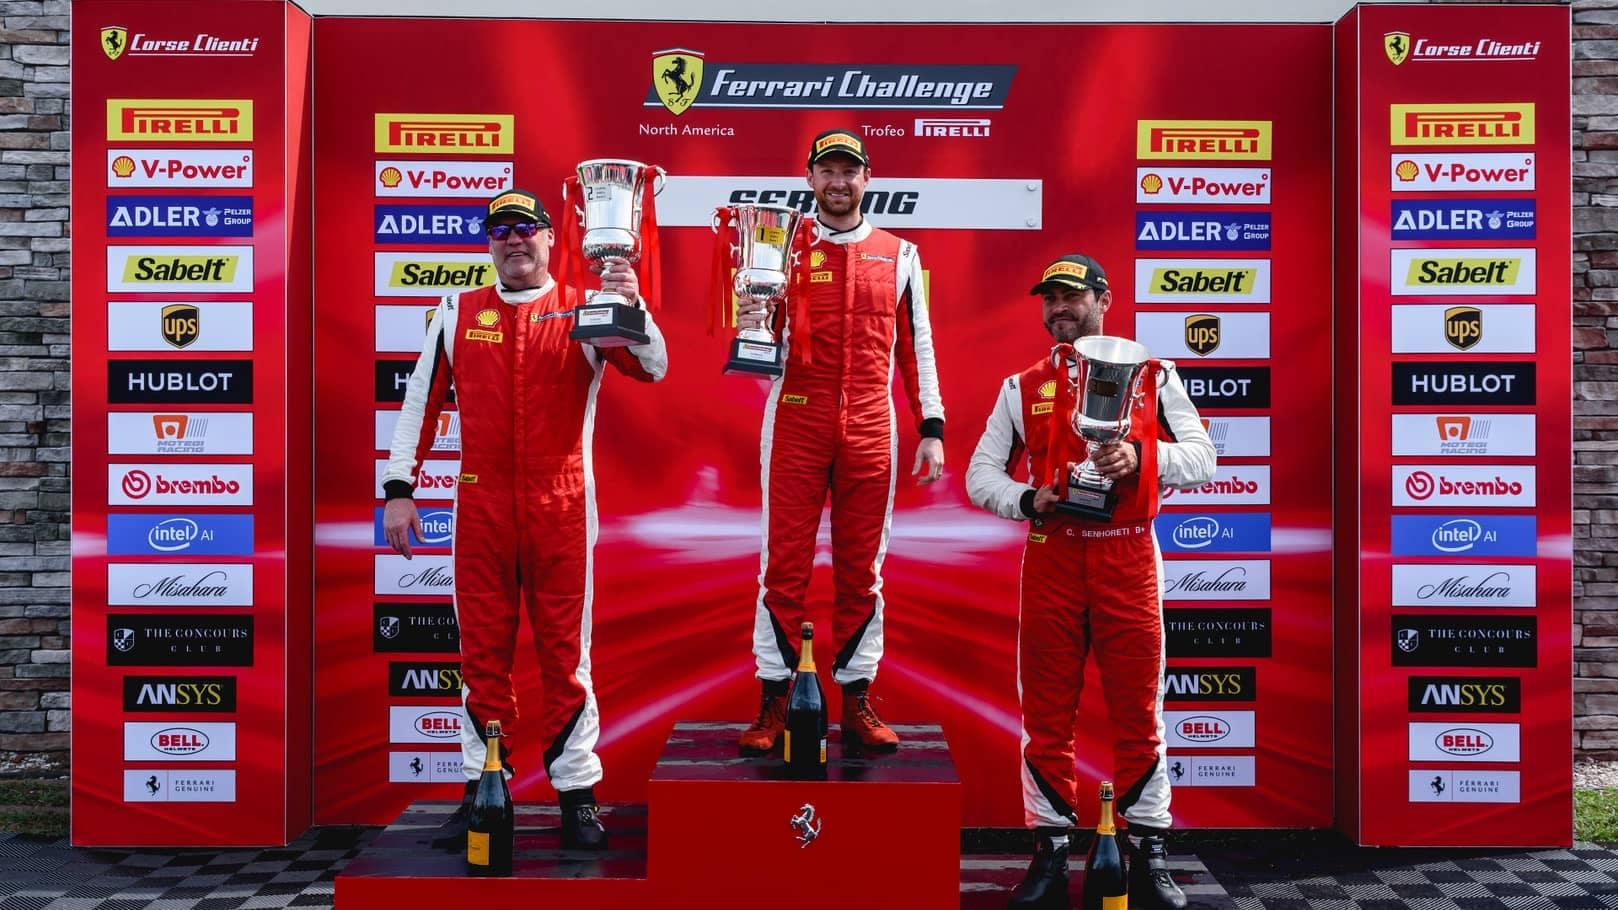 ferrari challenge 2019 podium